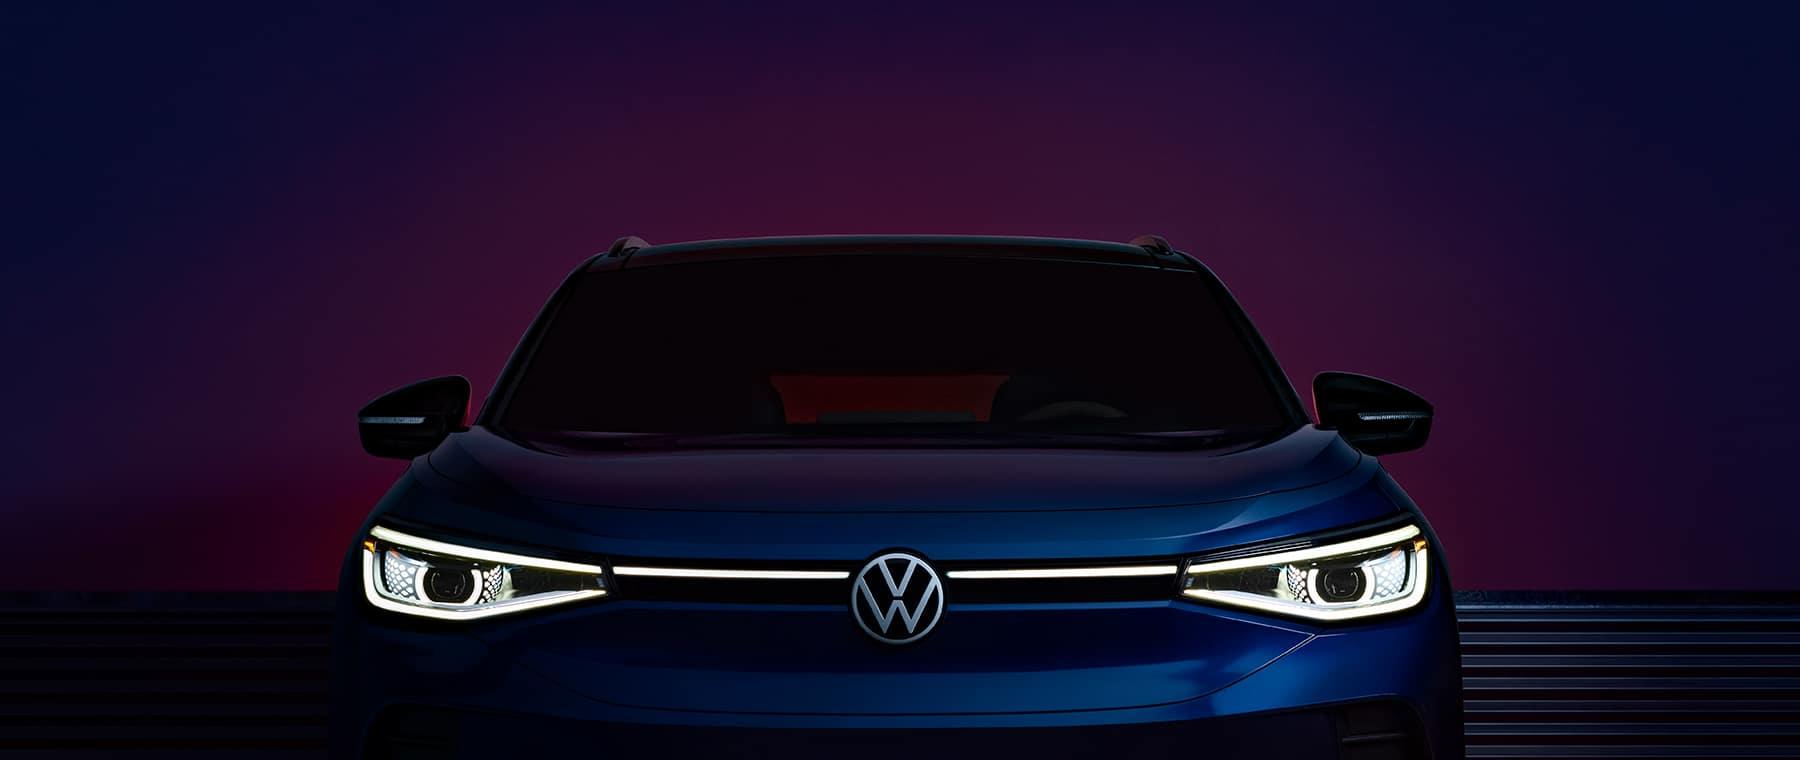 VW Main Banner 3